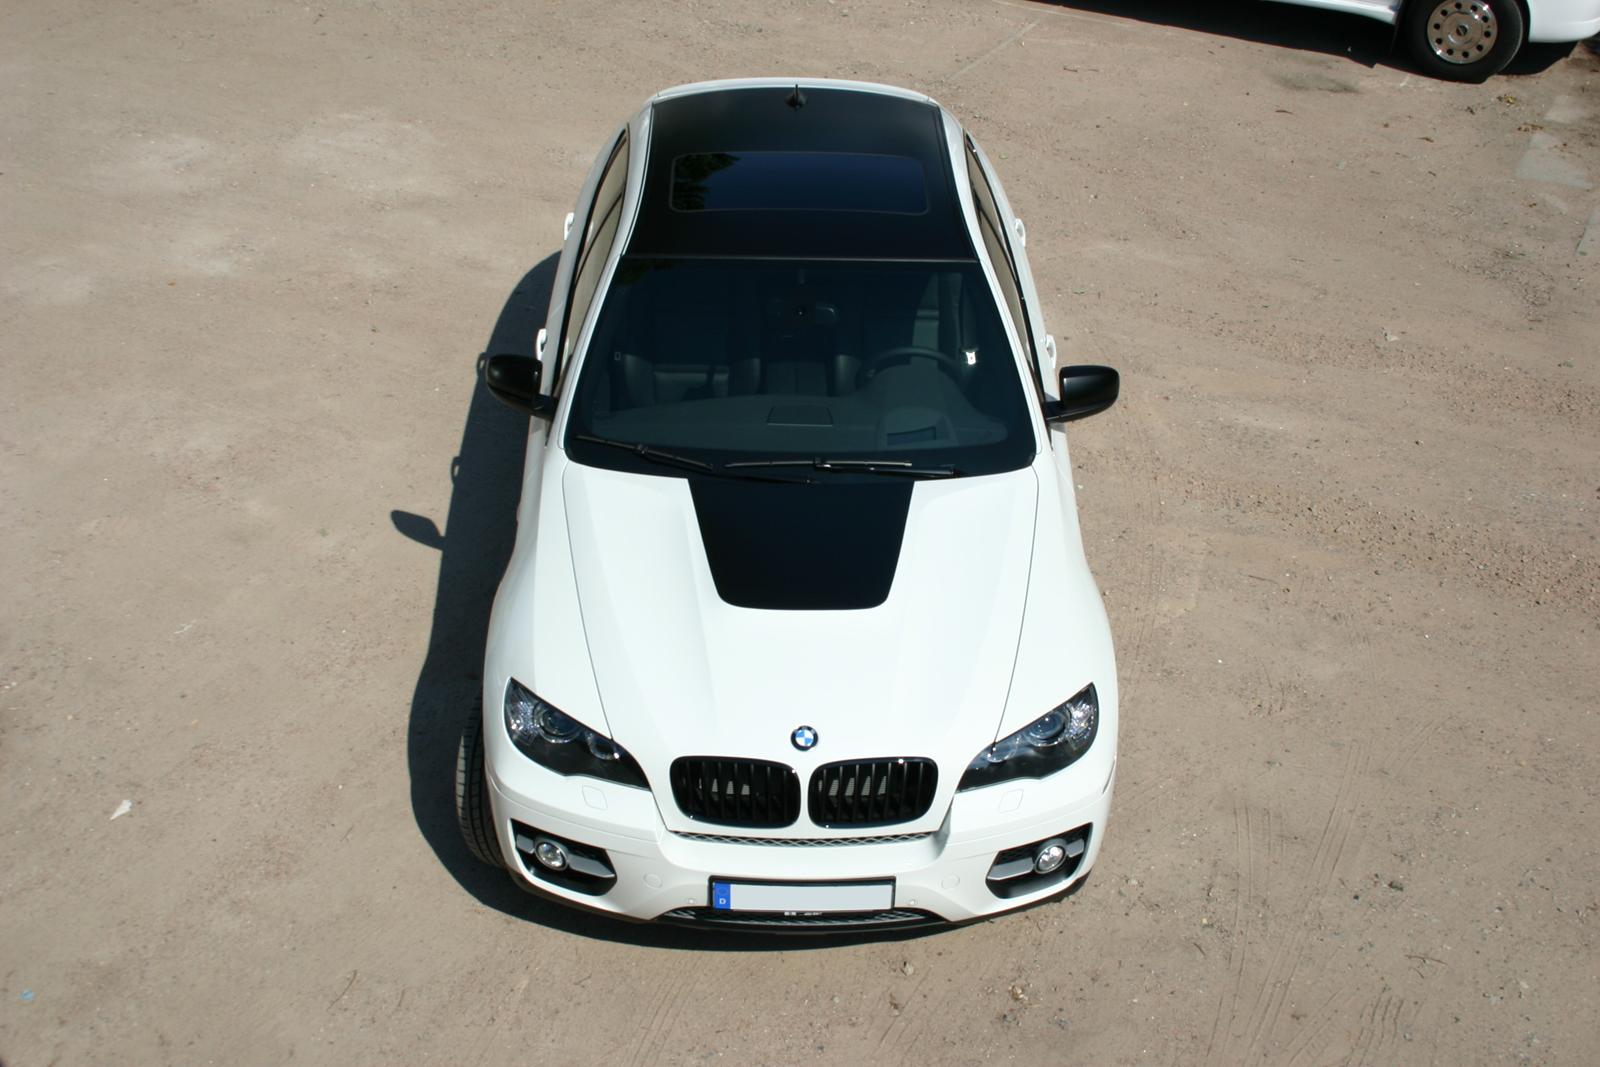 BMW_X6_TEILFOLIERUNG_SCHWARZ_MATT_DACH_HUTZE_04